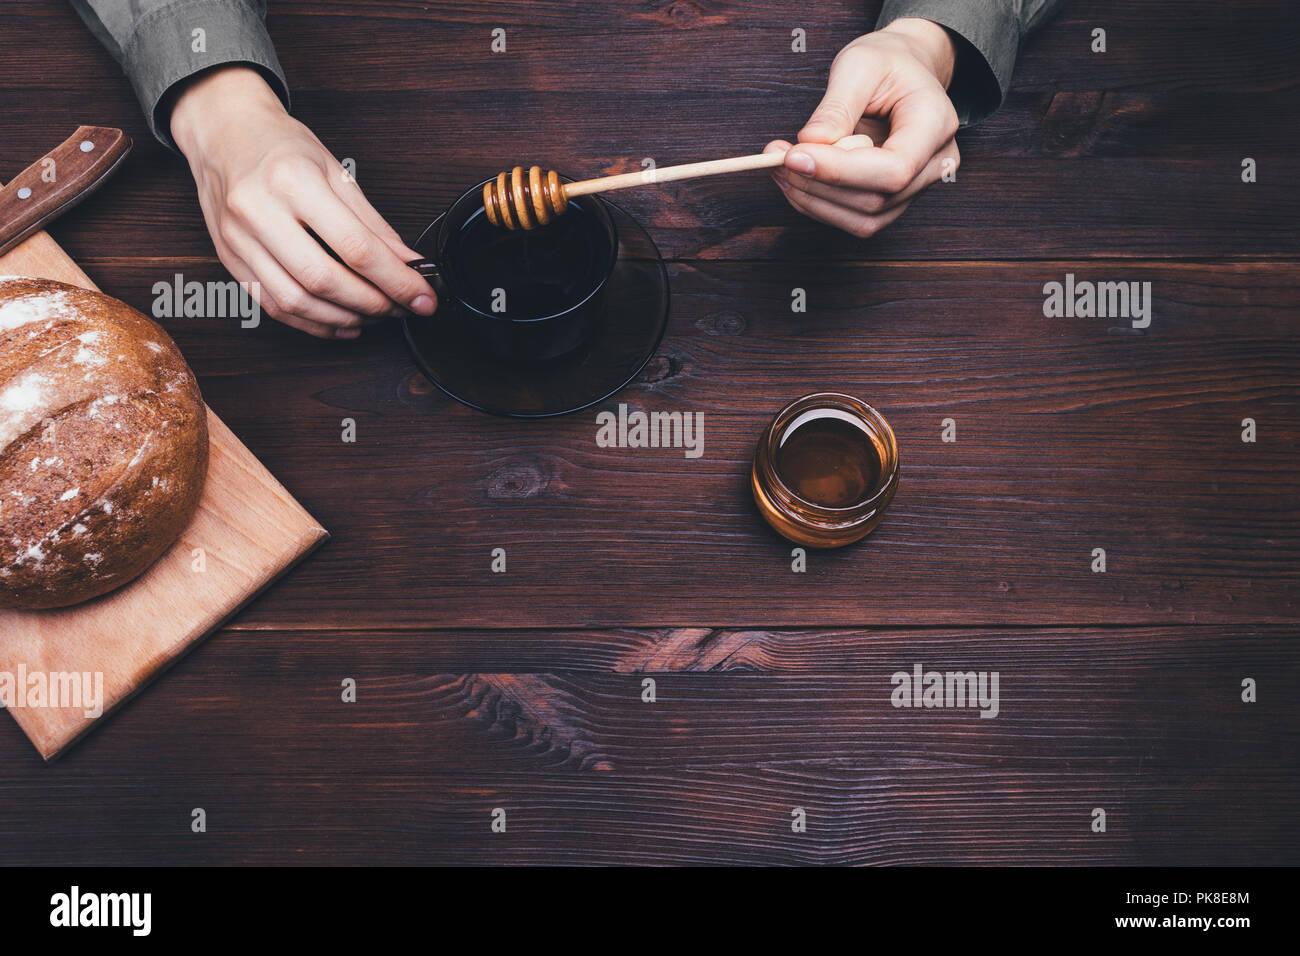 01335a73182 Dripping Honey Woman Stock Photos & Dripping Honey Woman Stock ...